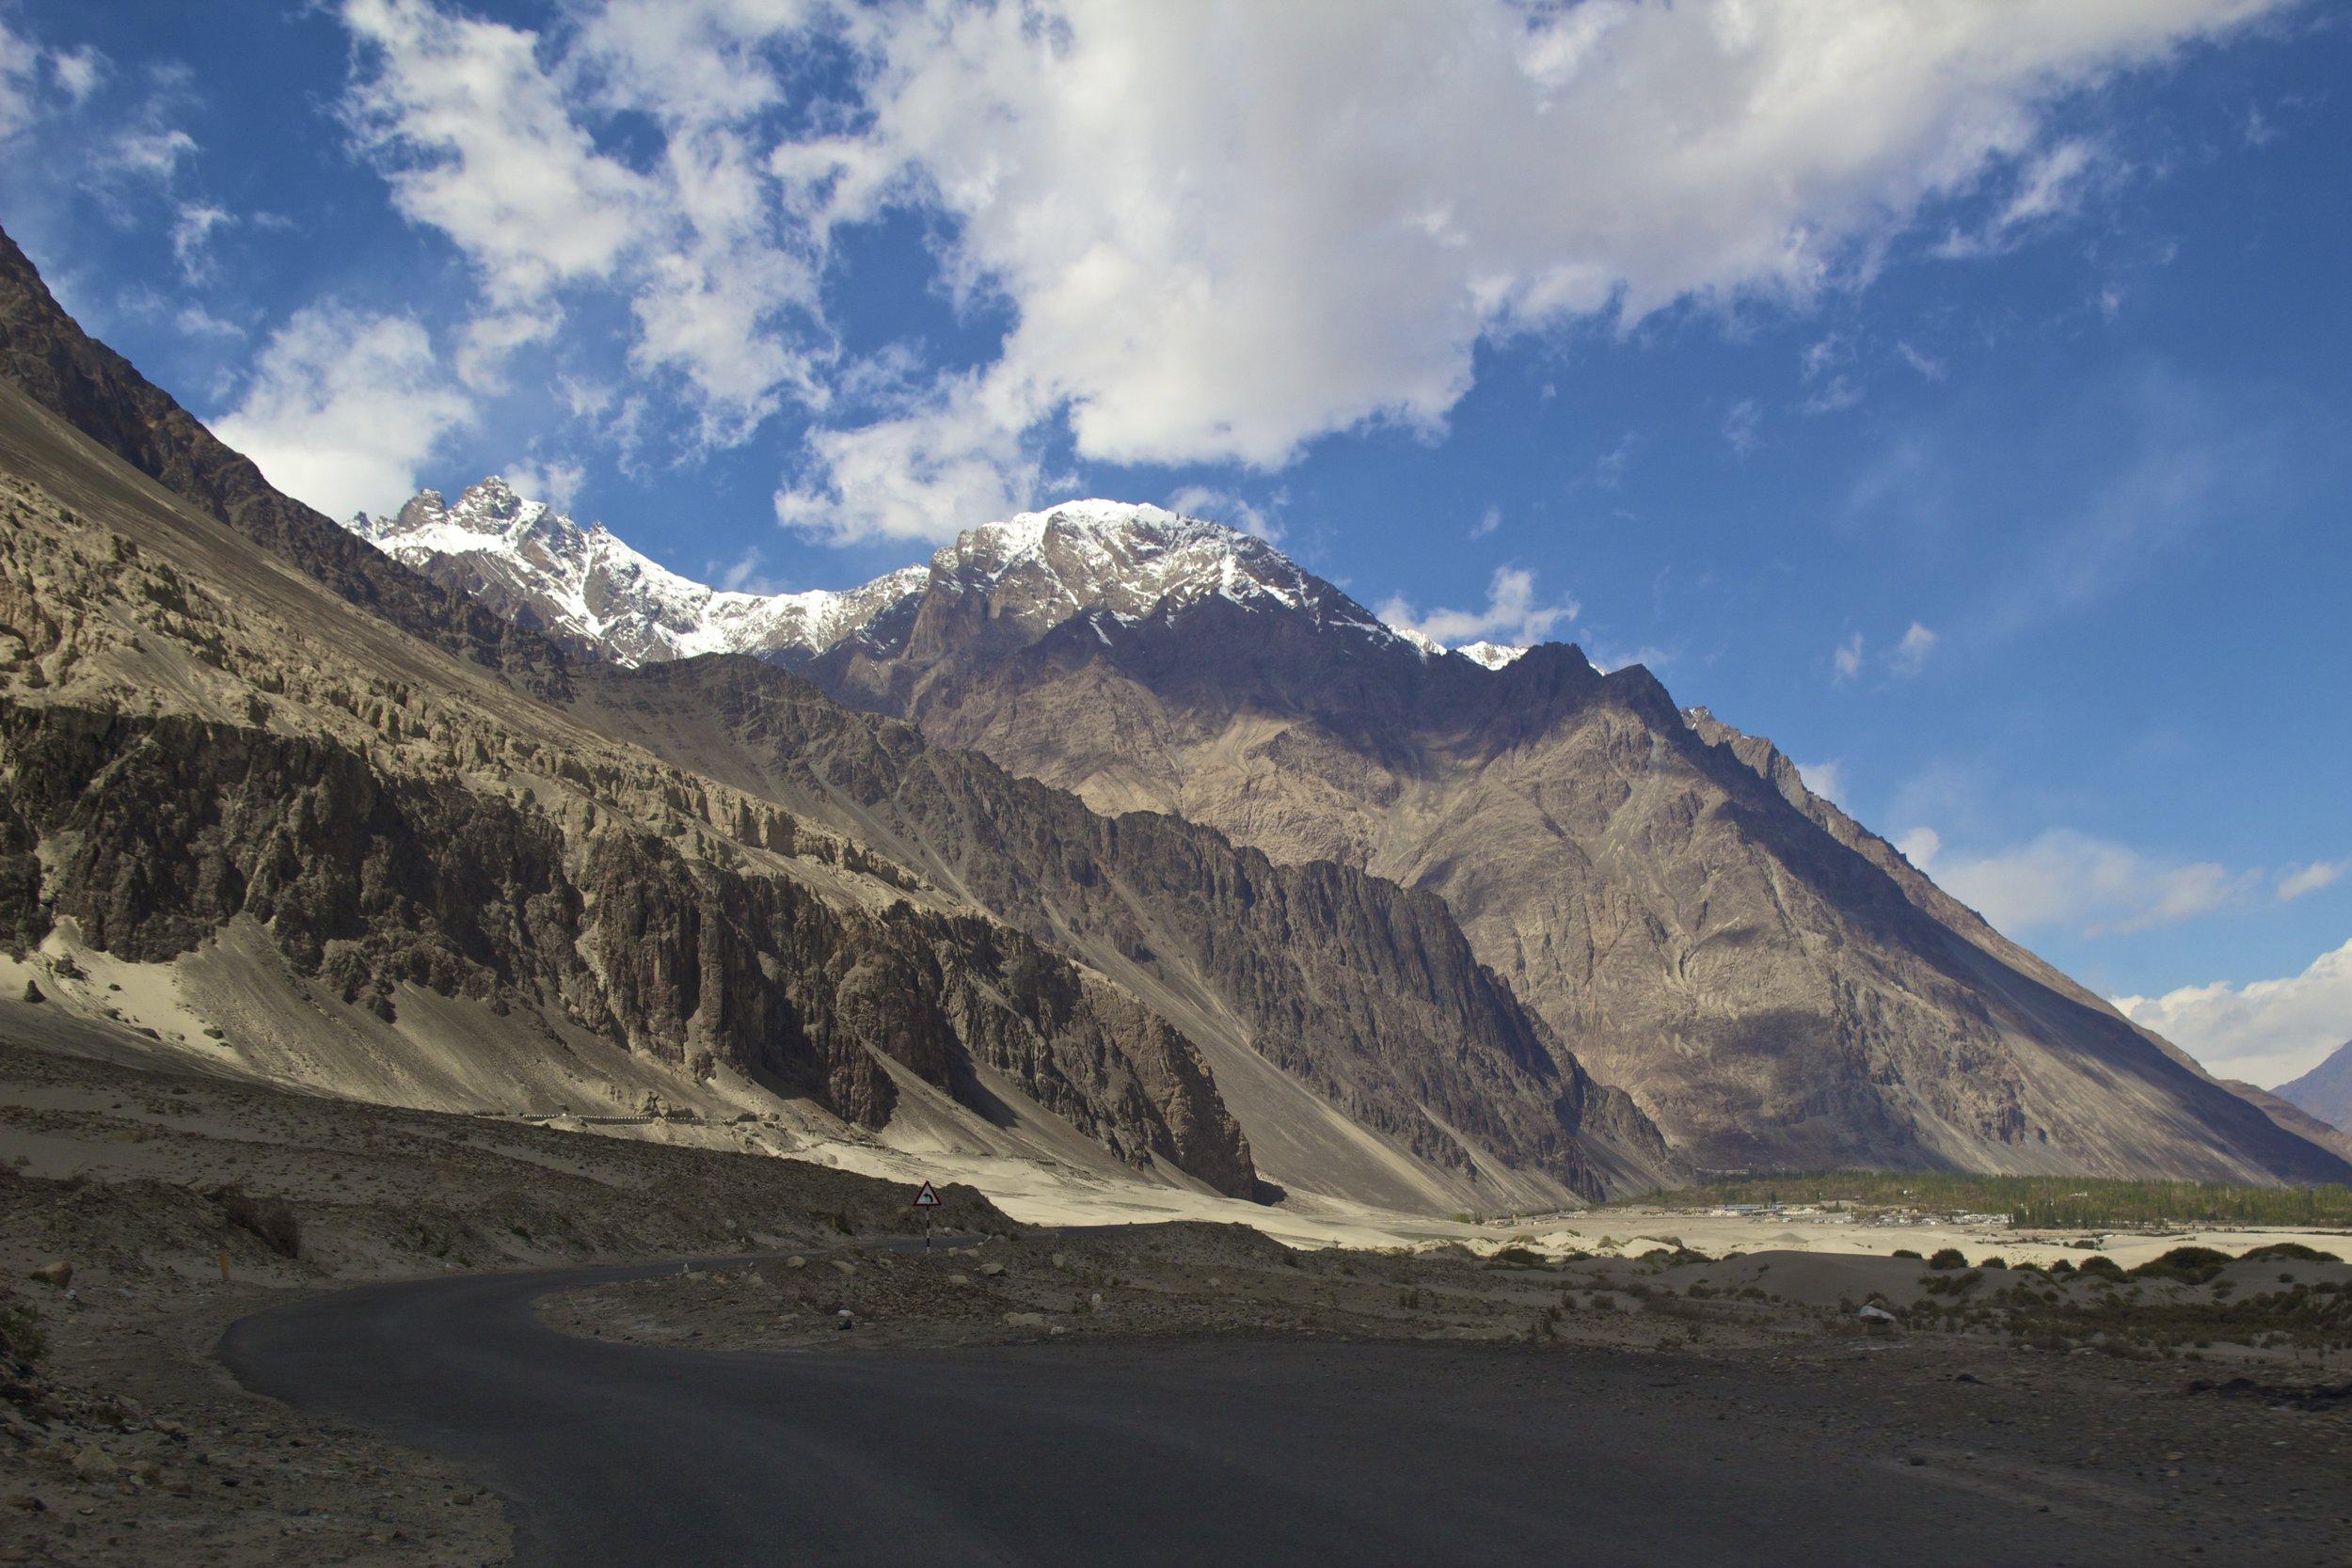 Nubra Valley Ladakh Kashmir Indian Himalayas Roads 7.jpg